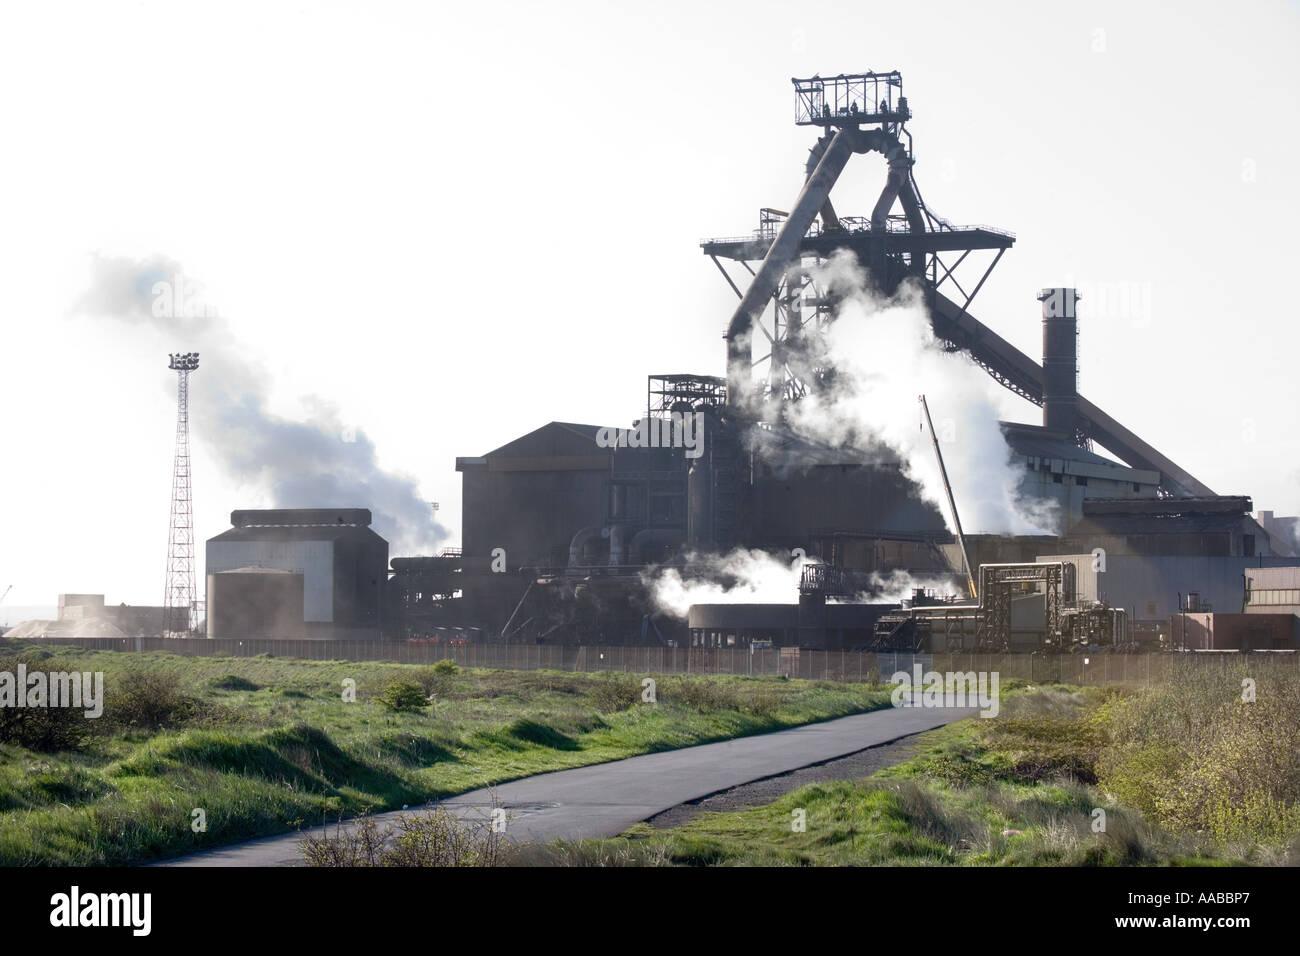 Redcar steelworks, Teeside, UK - Stock Image